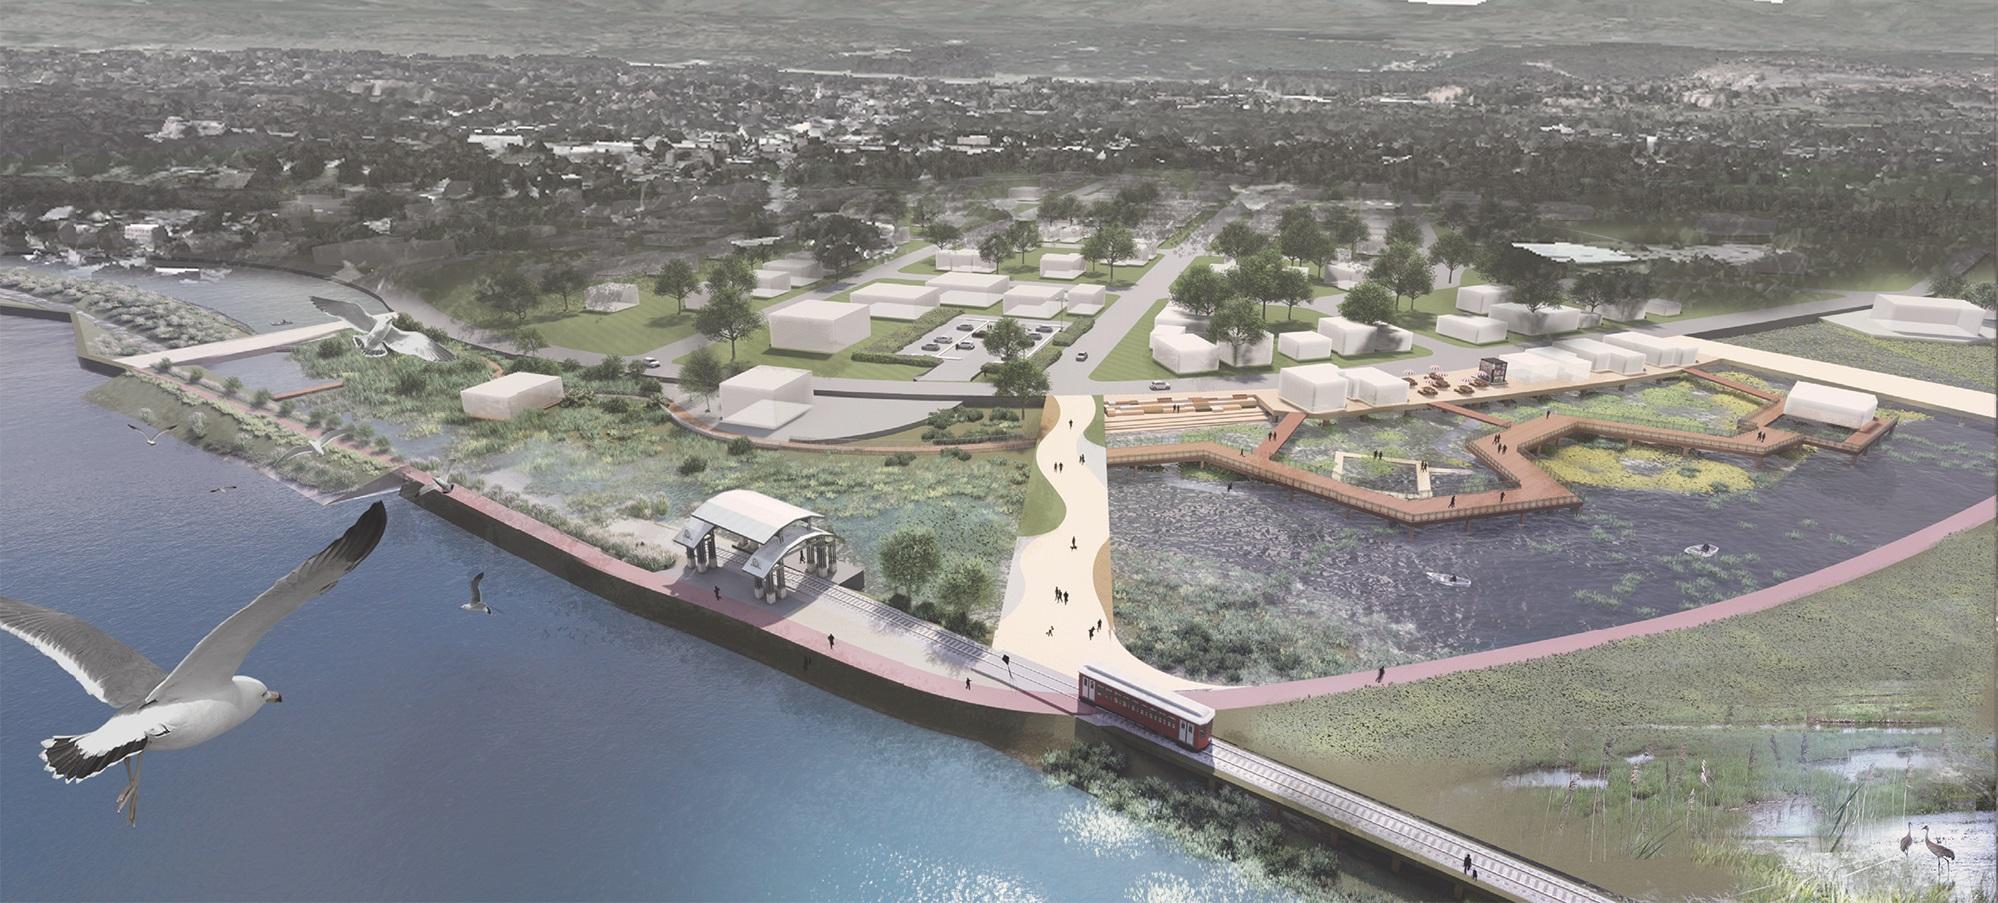 Digital image of a landscape architecture design